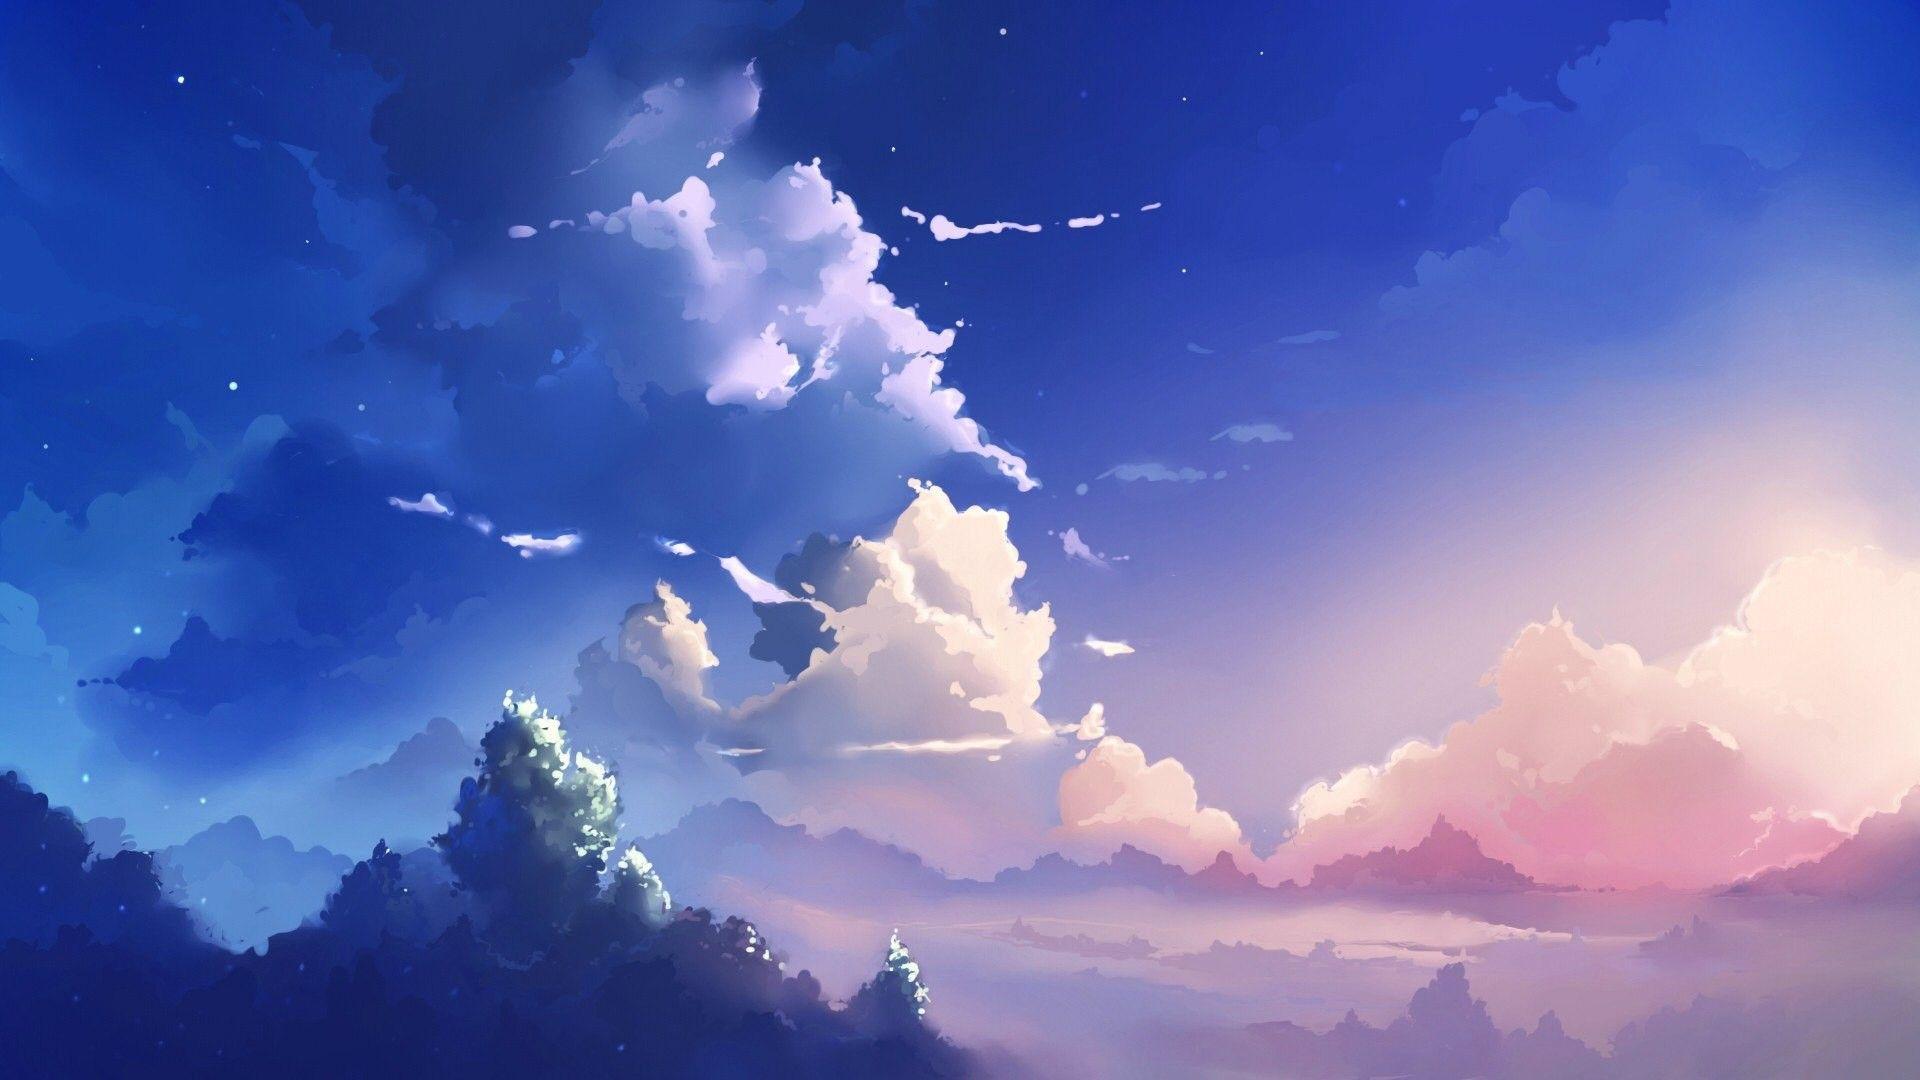 1920x1080 Beautiful Aesthetic Light Blue Hình nền Anime